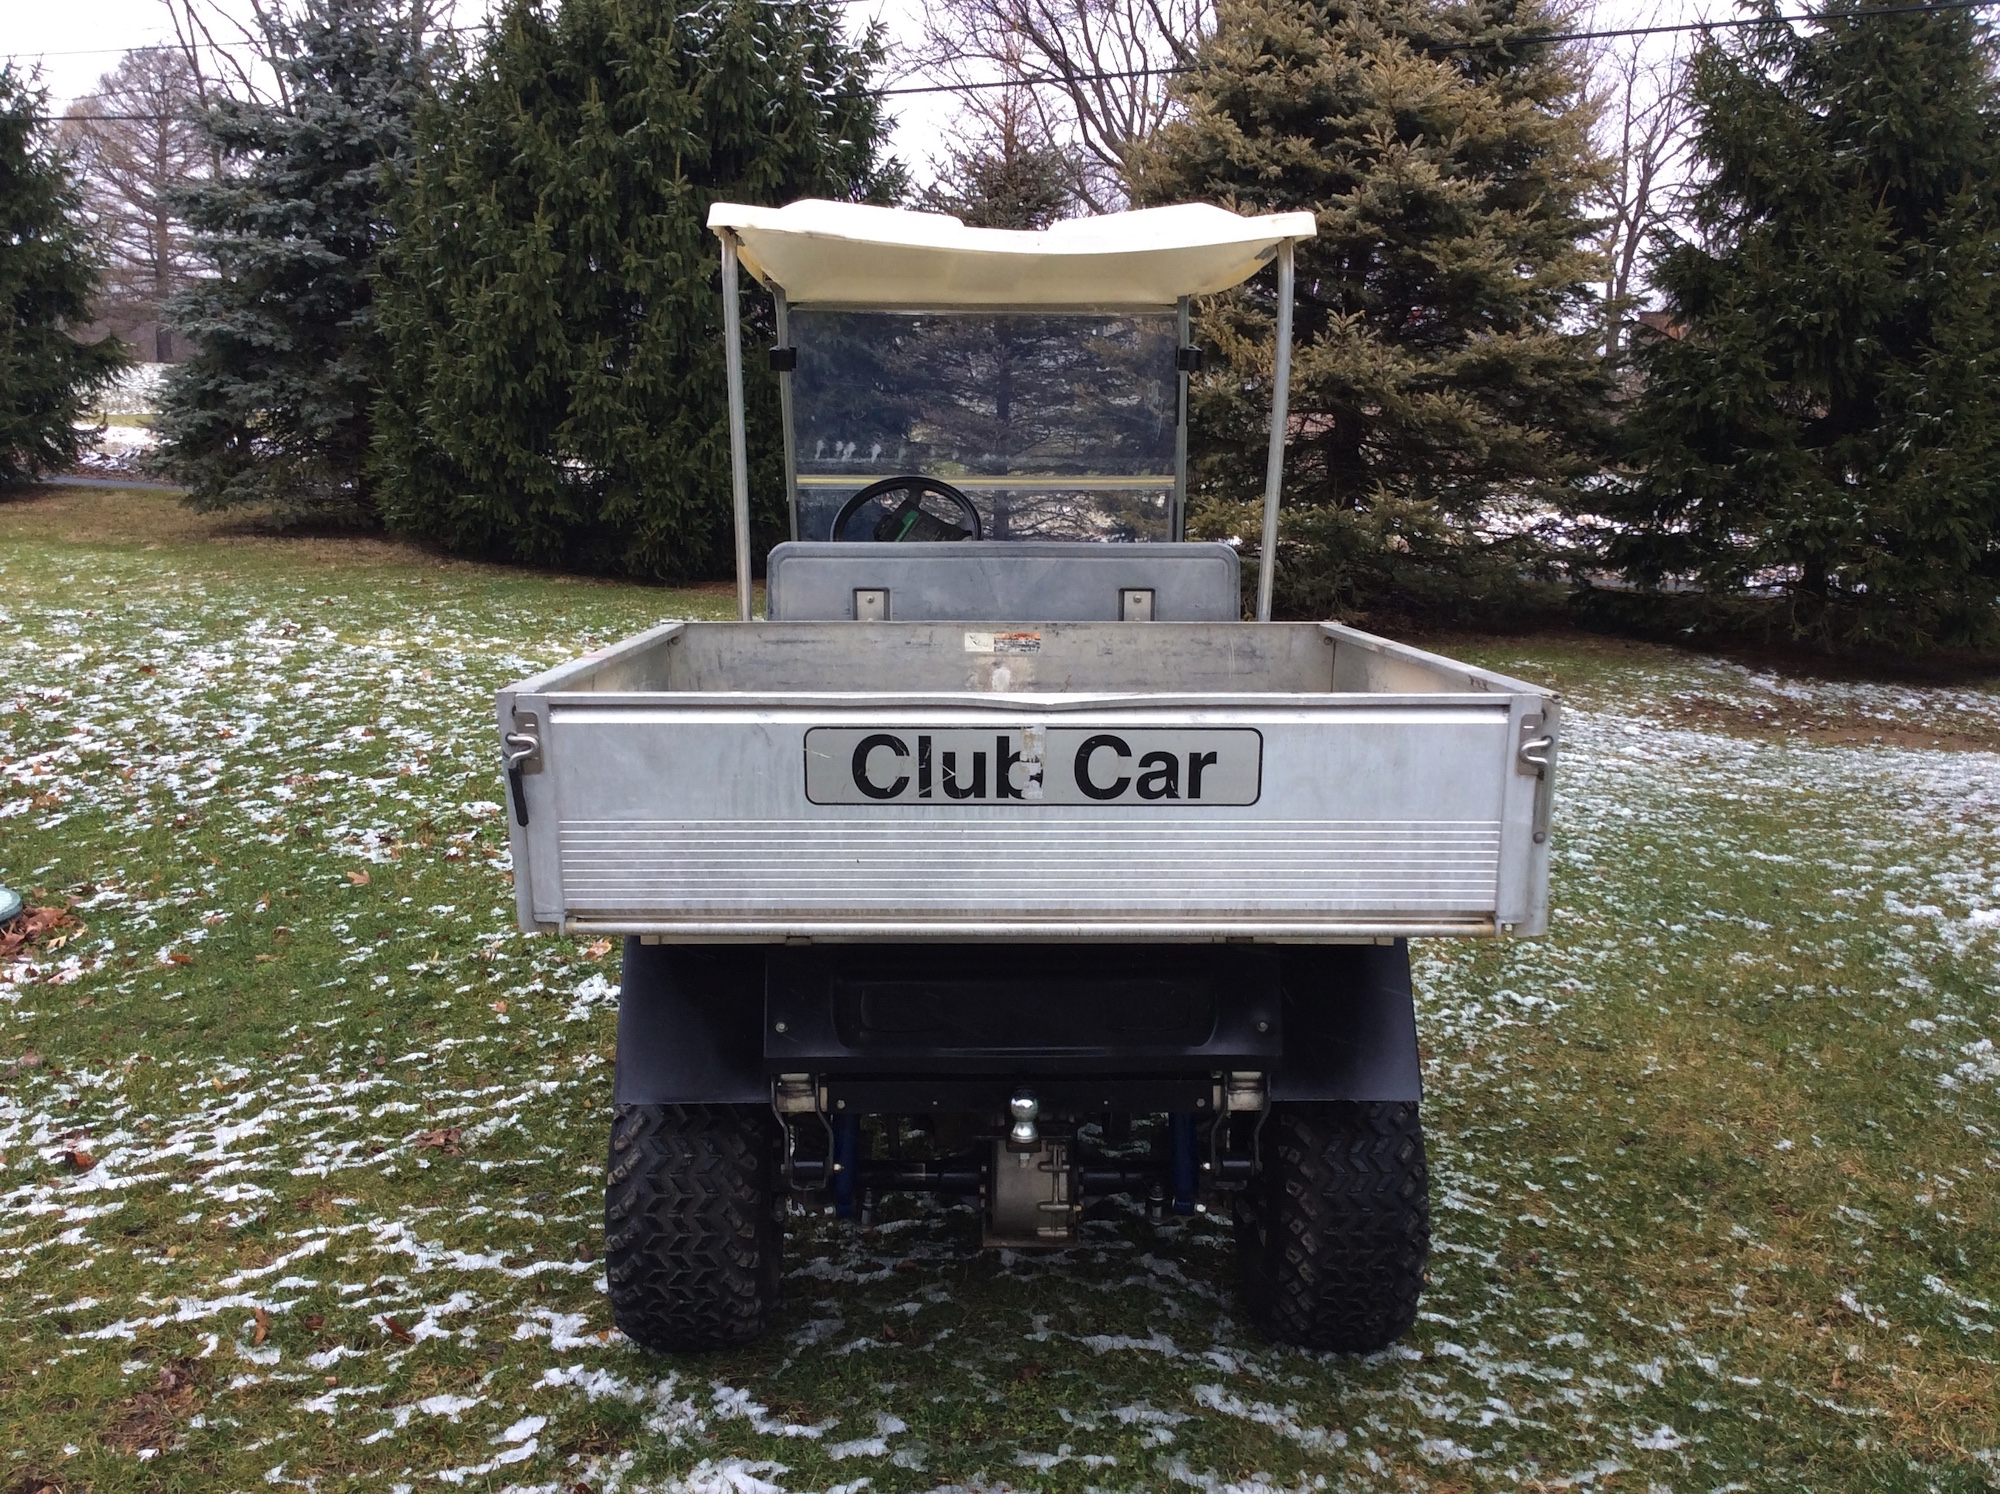 ClubCar-Carryall-Turf2-UtilityVehicle-05